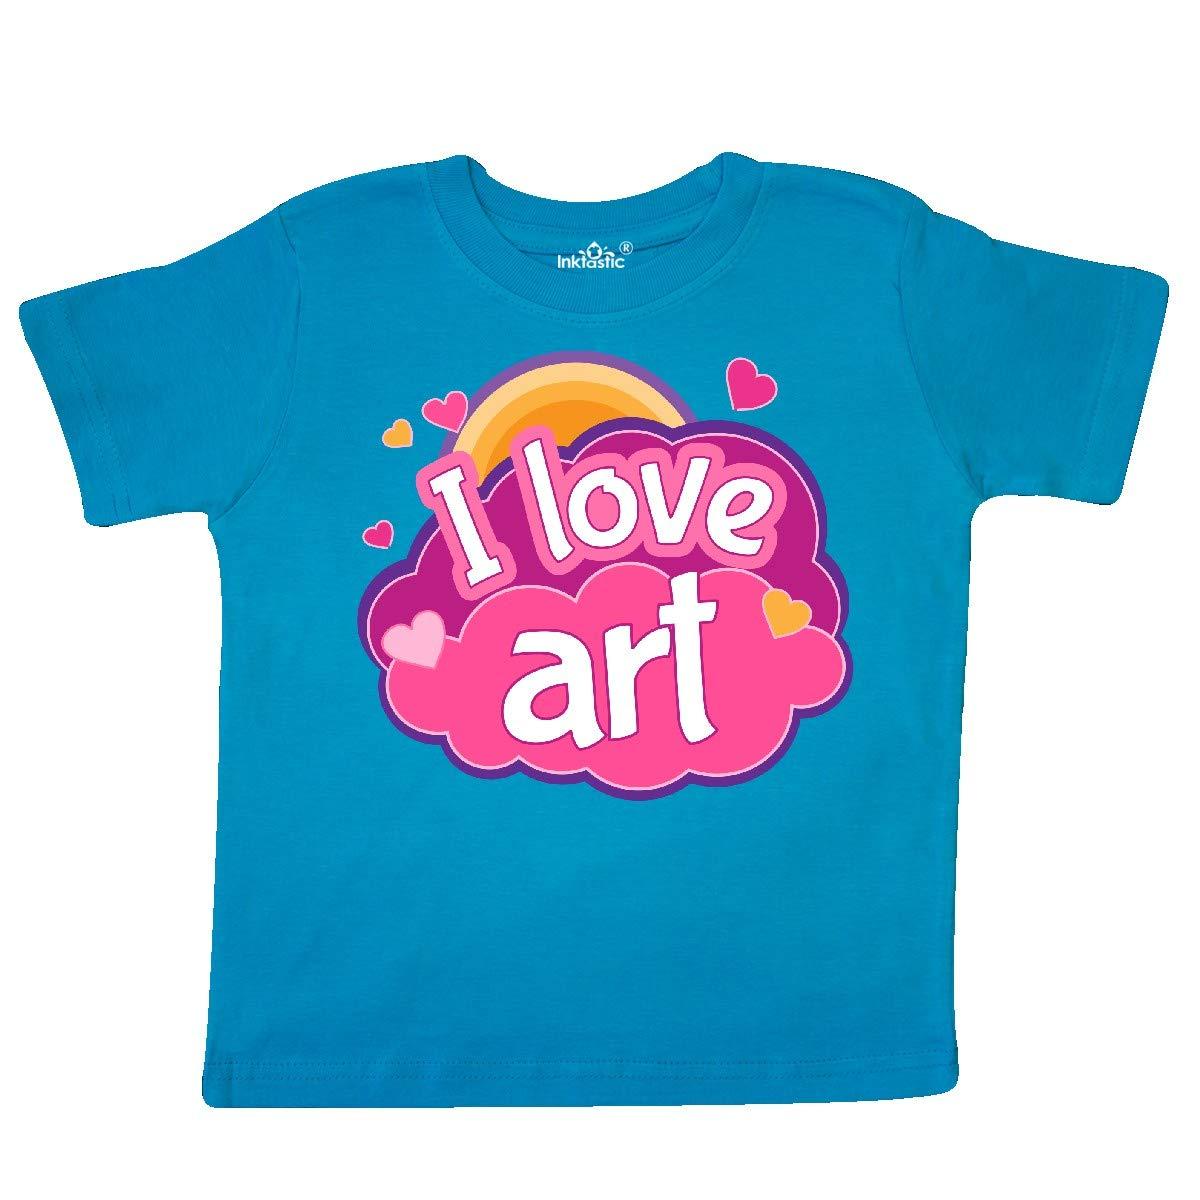 inktastic Artist I Love Art Toddler T-Shirt